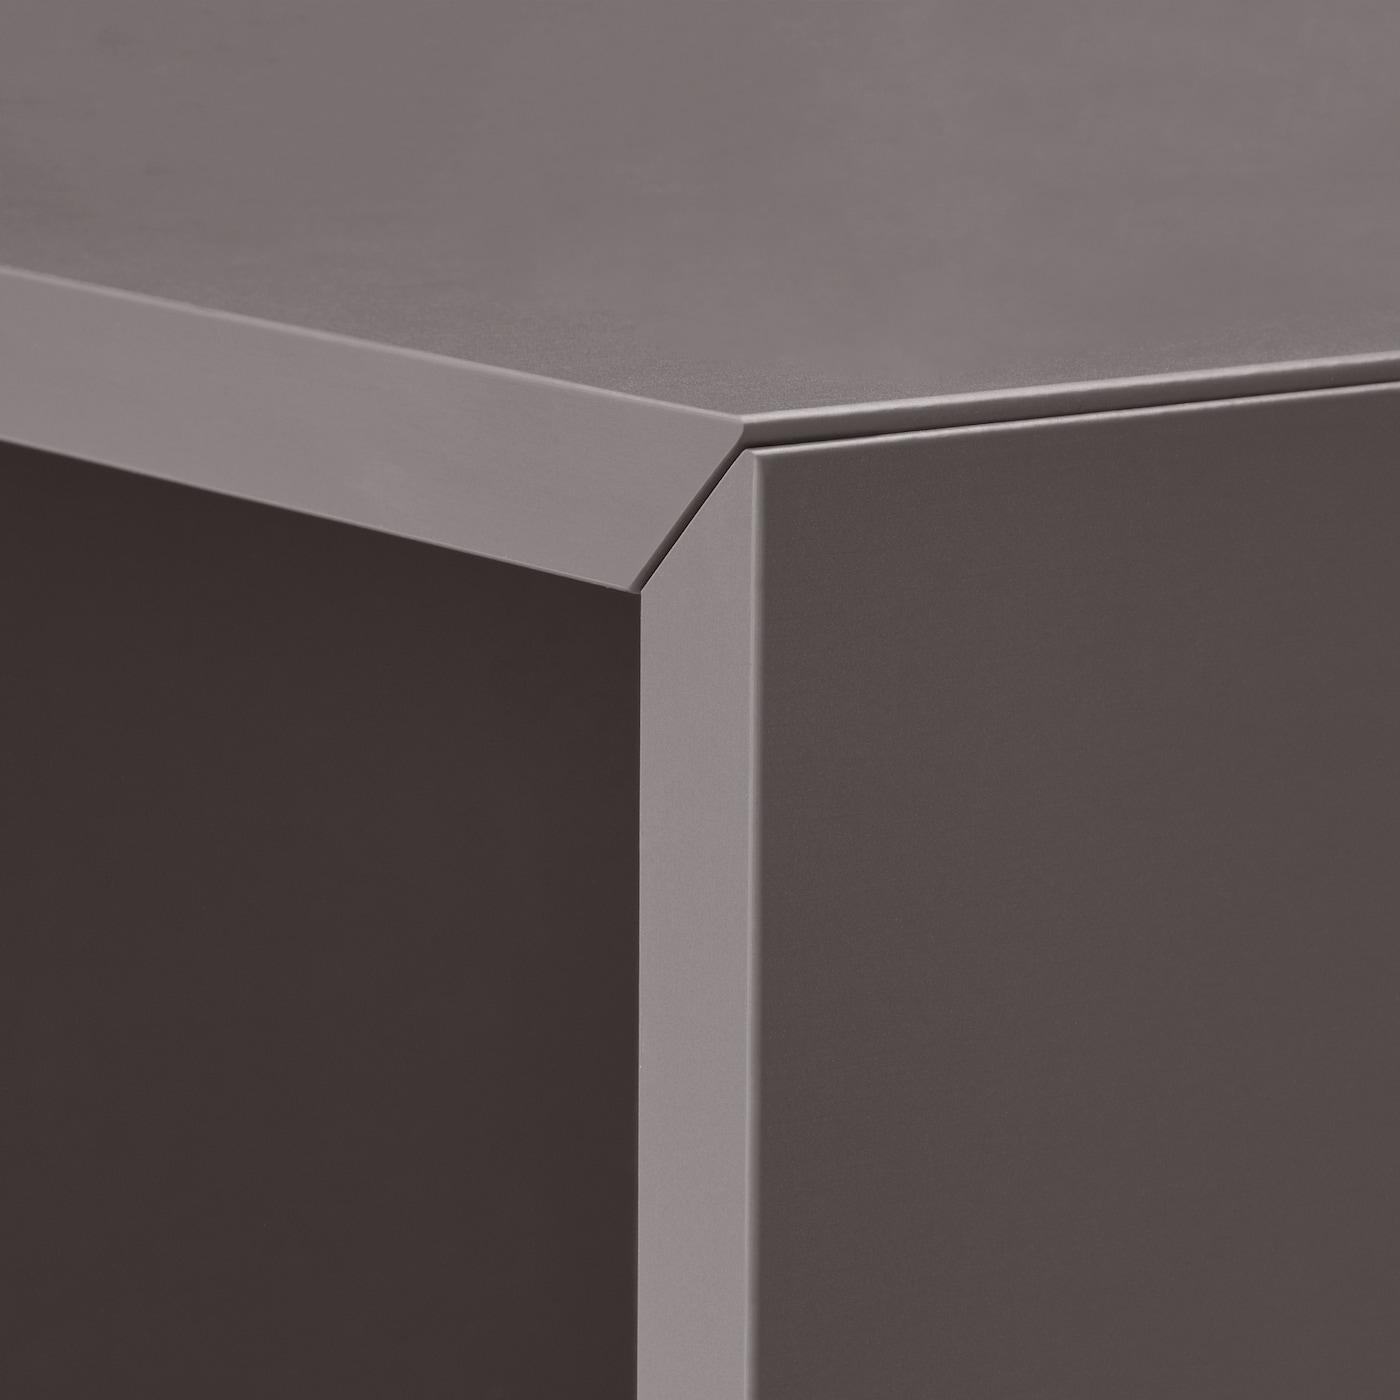 EKET Schrank, dunkelgrau, 35x35x35 cm